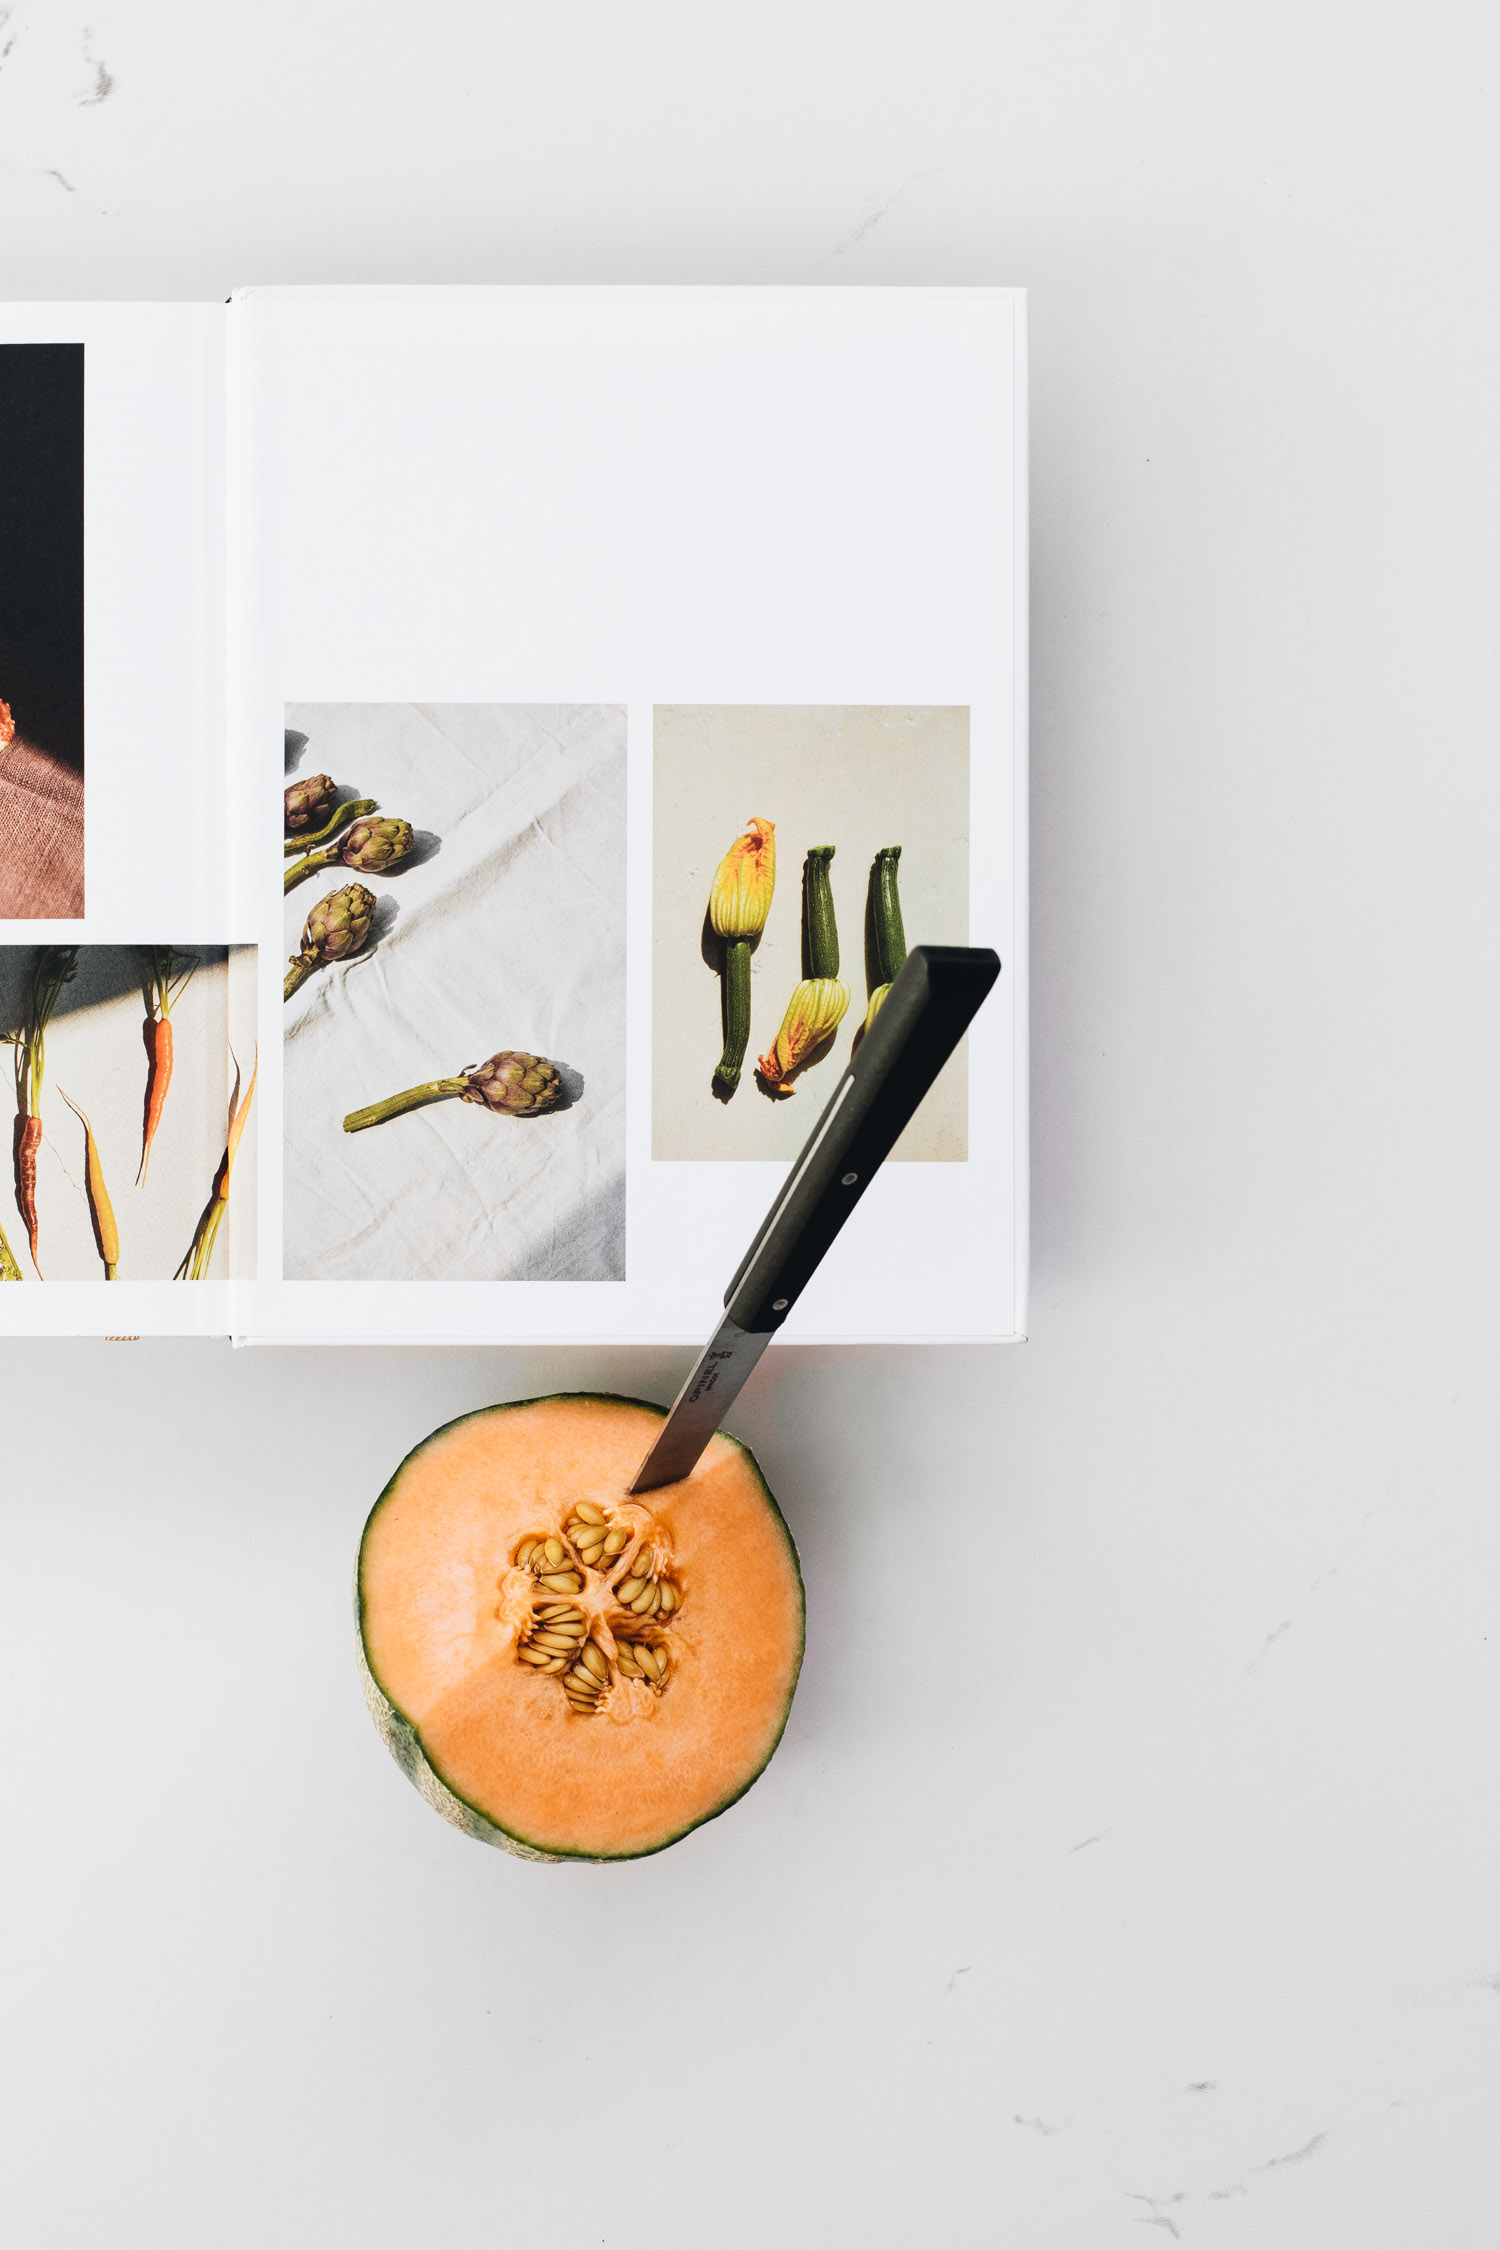 Rye Cookbook Club - The Modern Cook's Year by Anna Jones